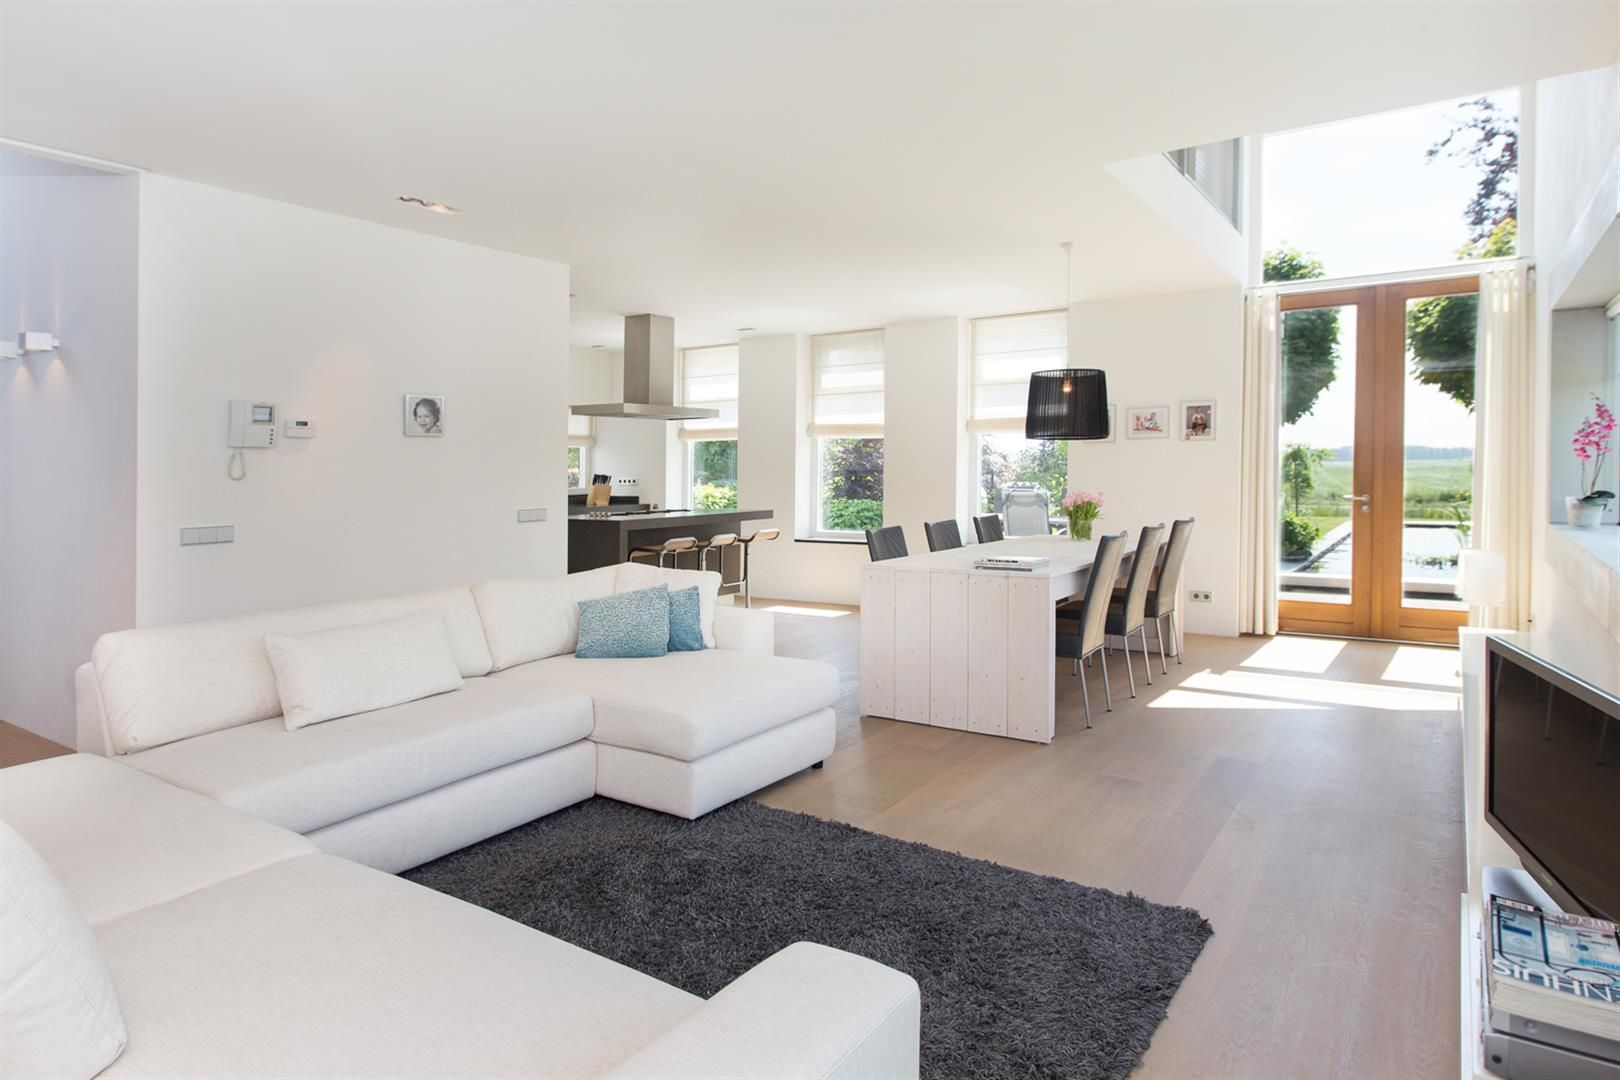 Zithoek moderne landelijke woning droomhuis pinterest for Interieur huizen